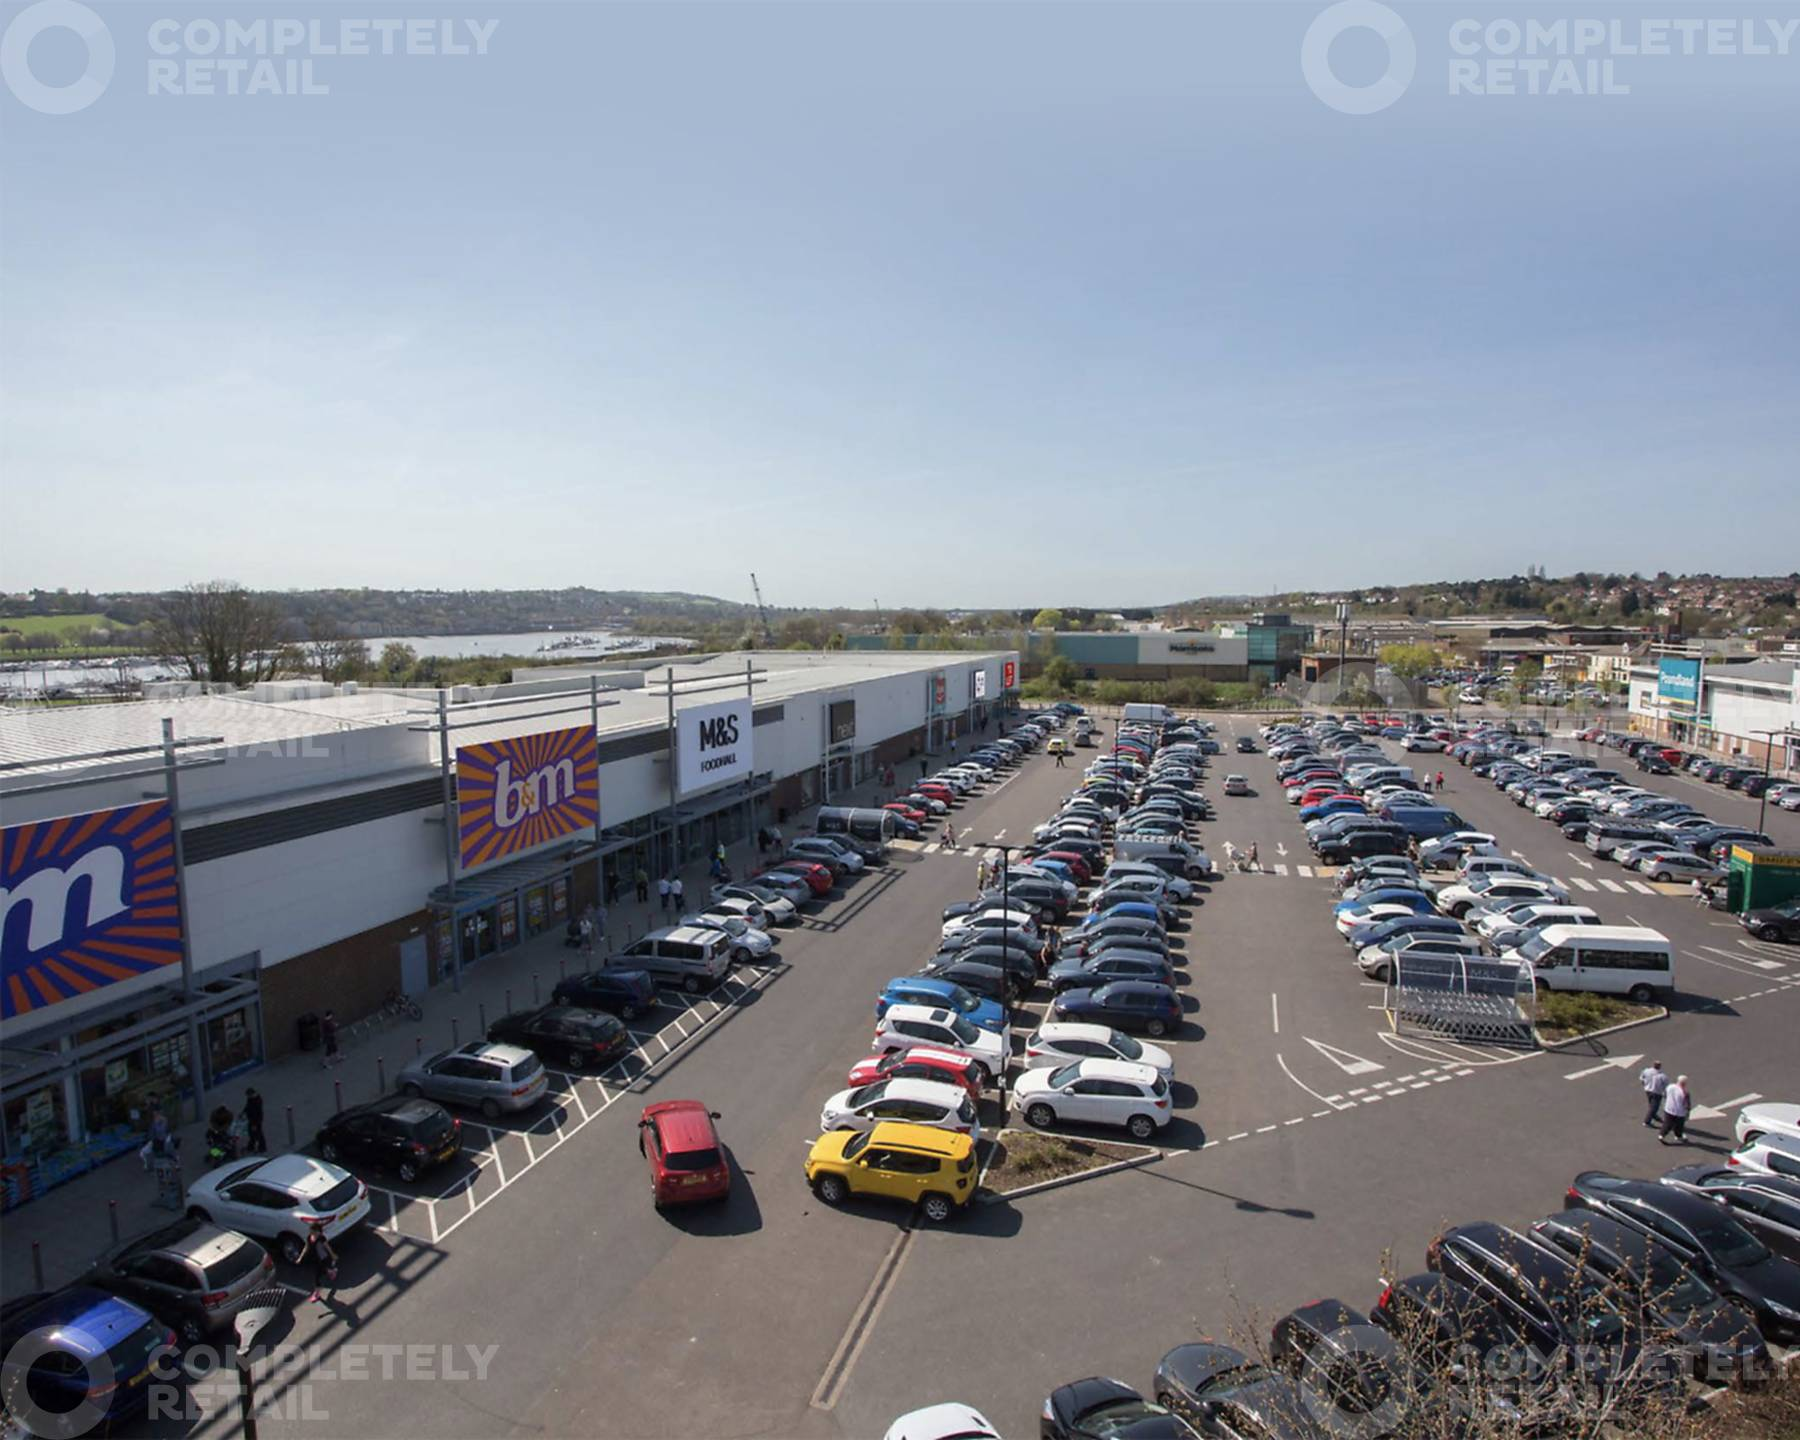 Strood Retail Park